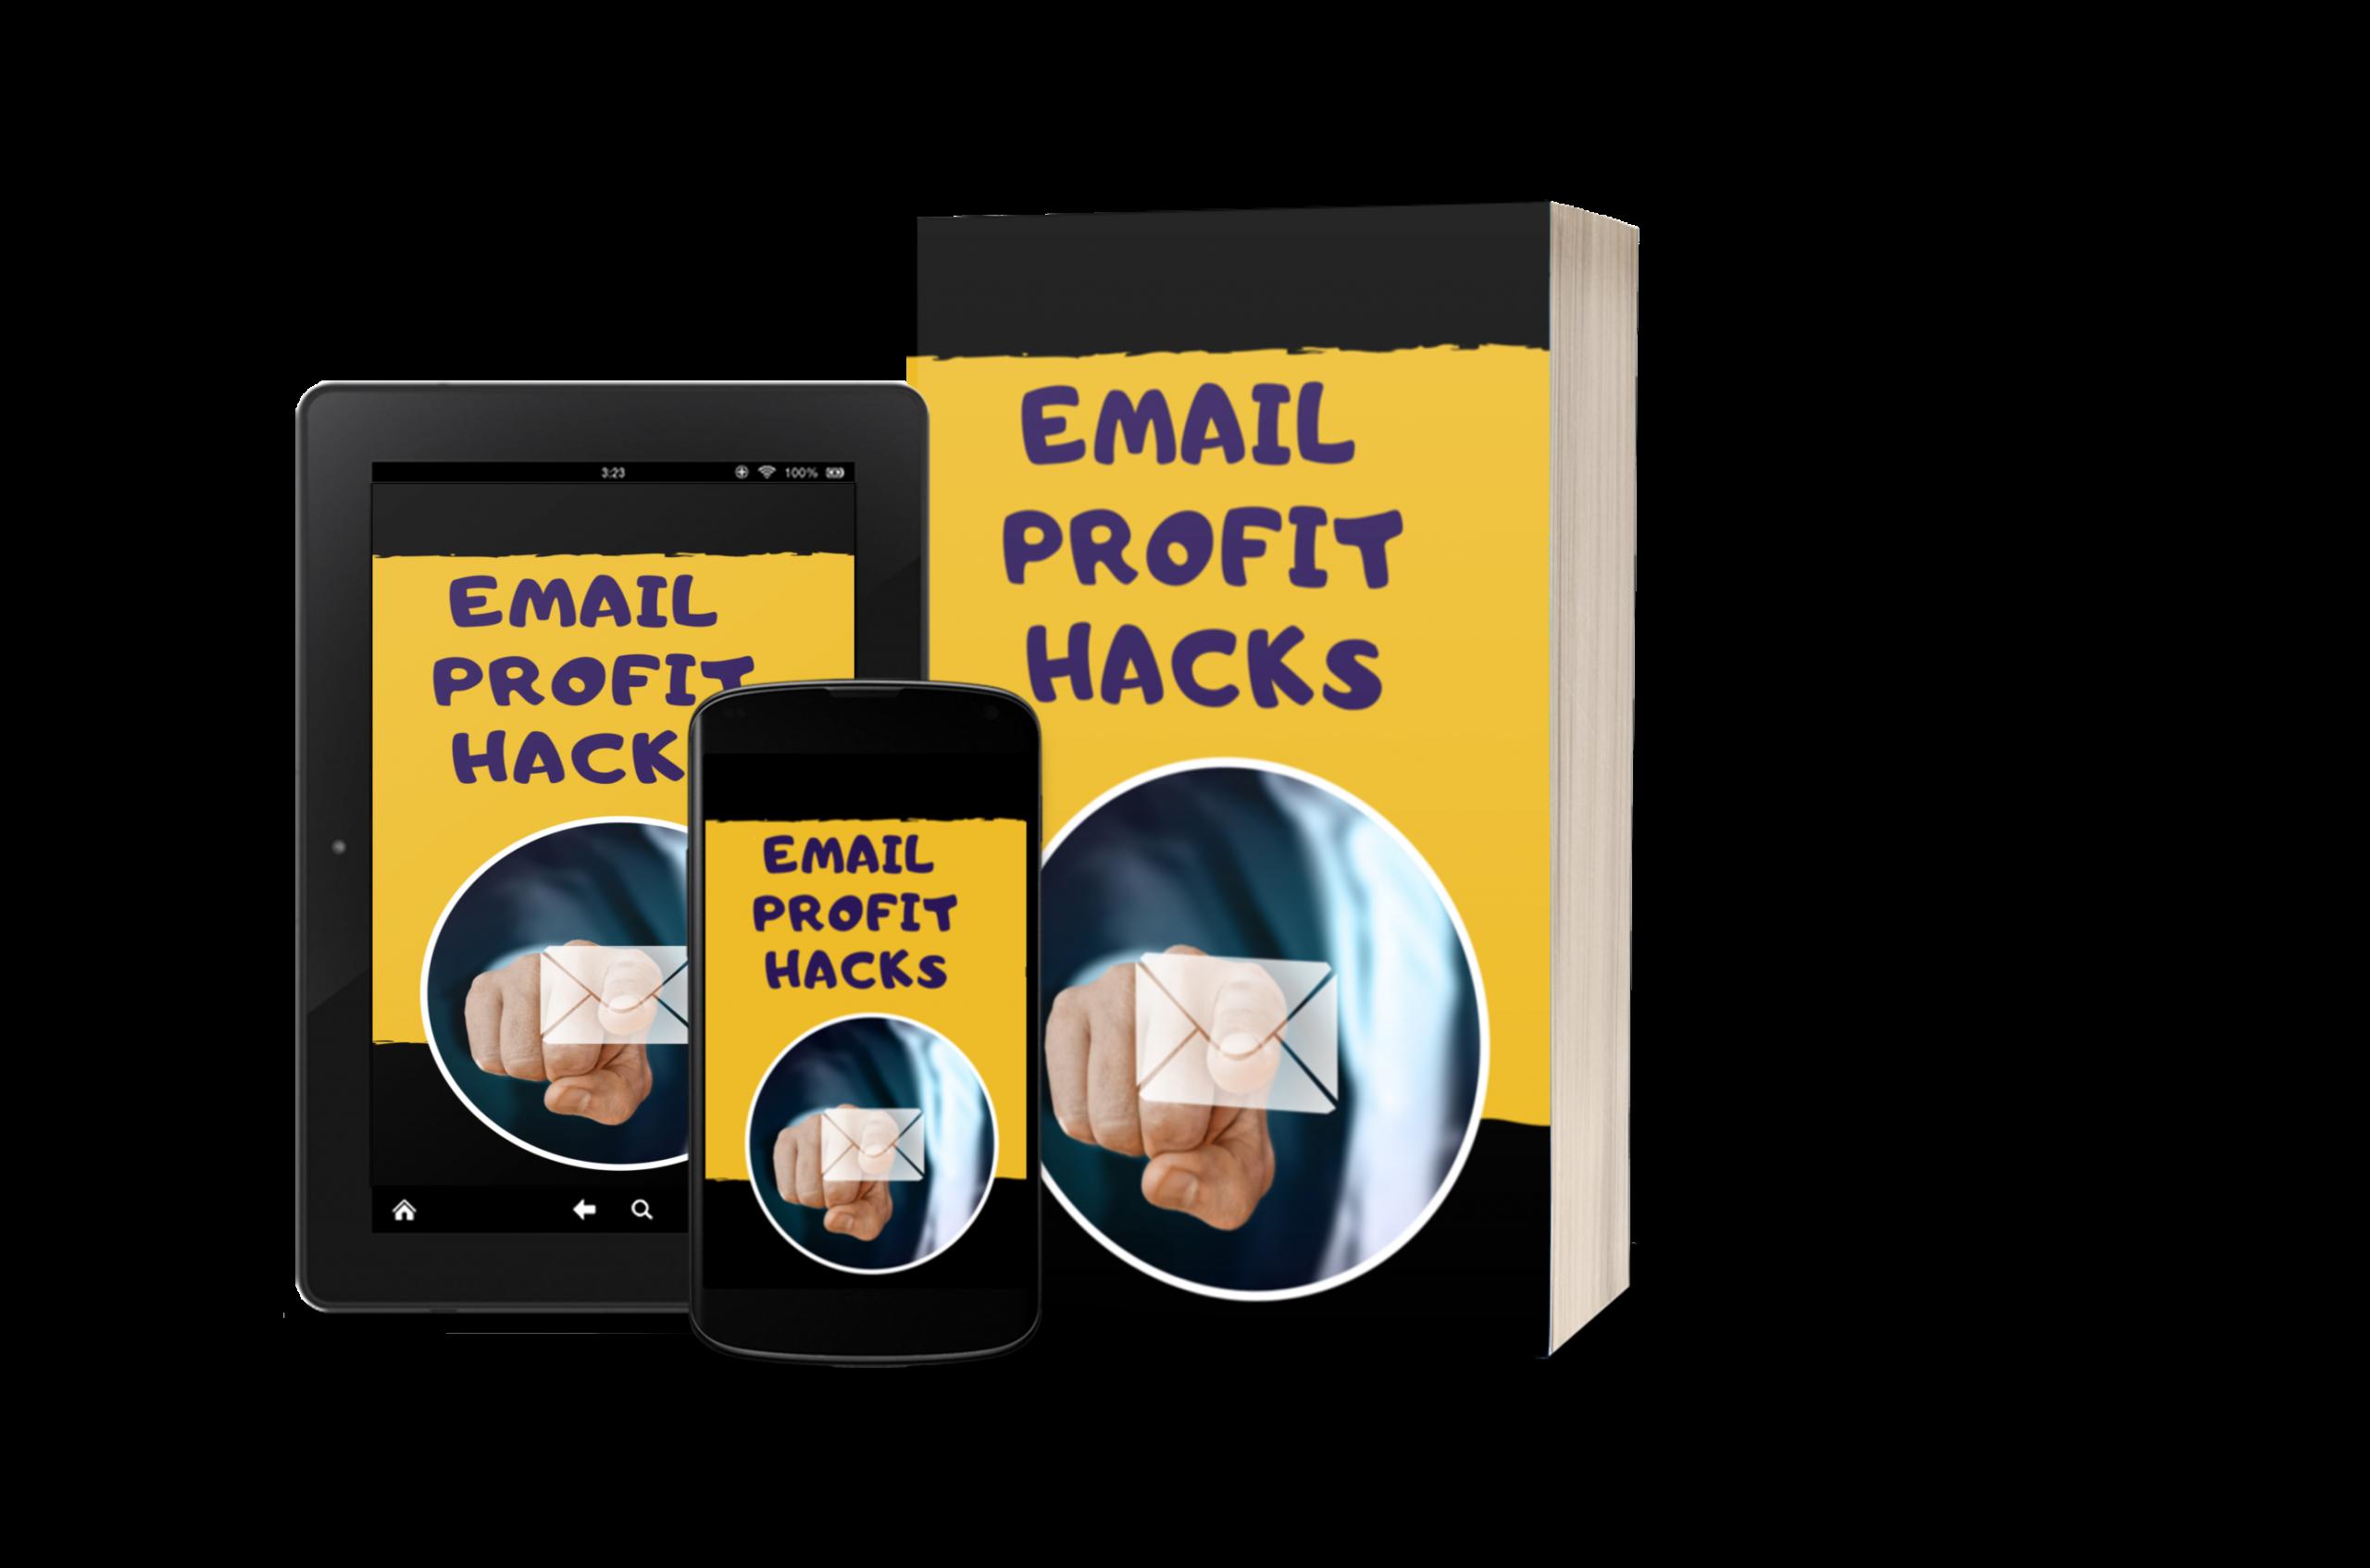 Email Profit Hacks Download